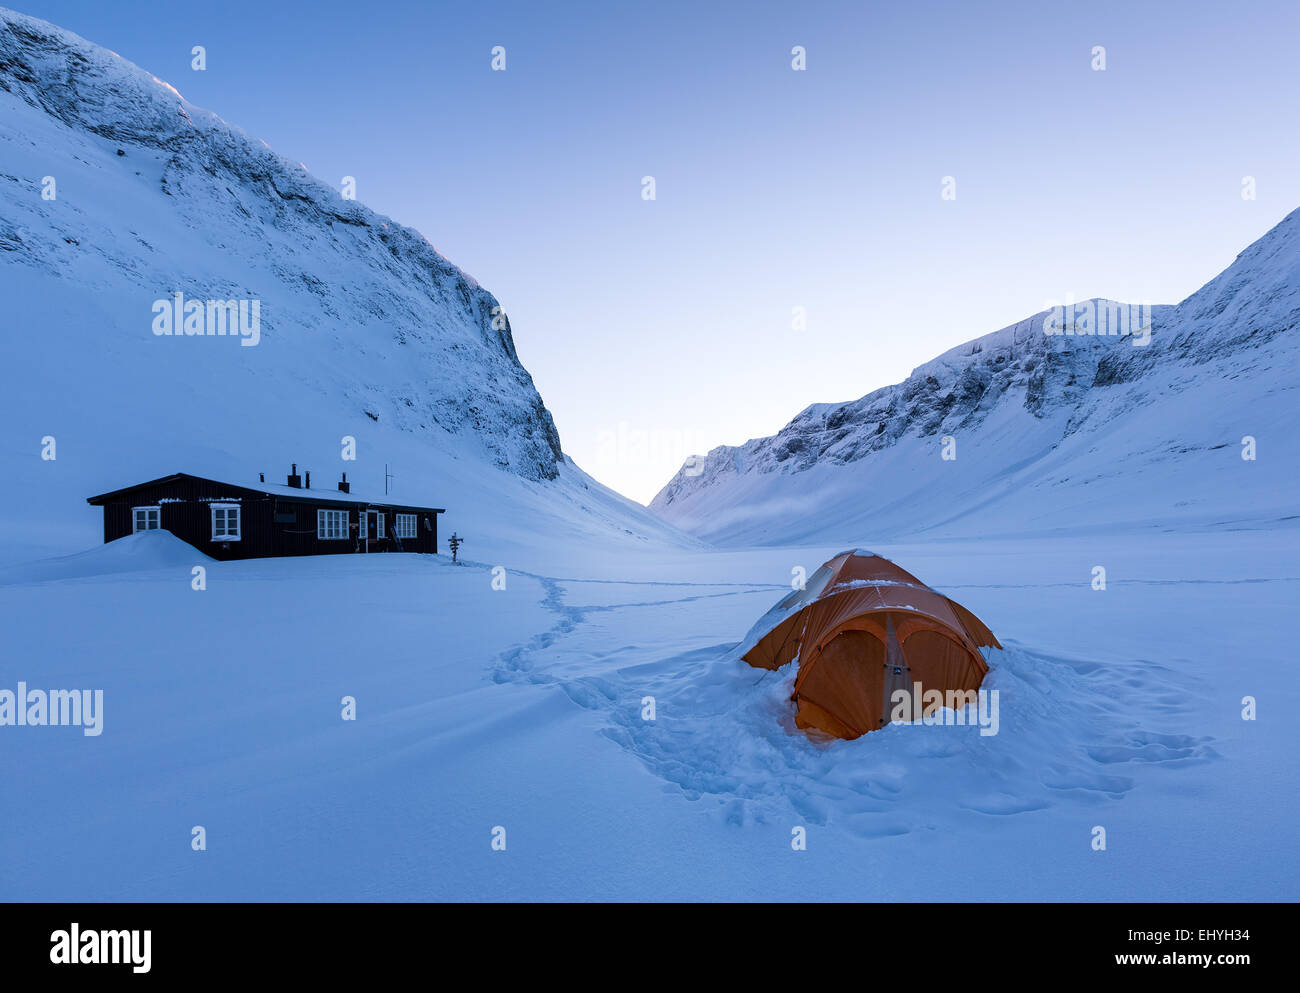 Nallostugan, zone de montagne Kebnekaise, Kiruna, Suède, Europe, UNION EUROPÉENNE Photo Stock